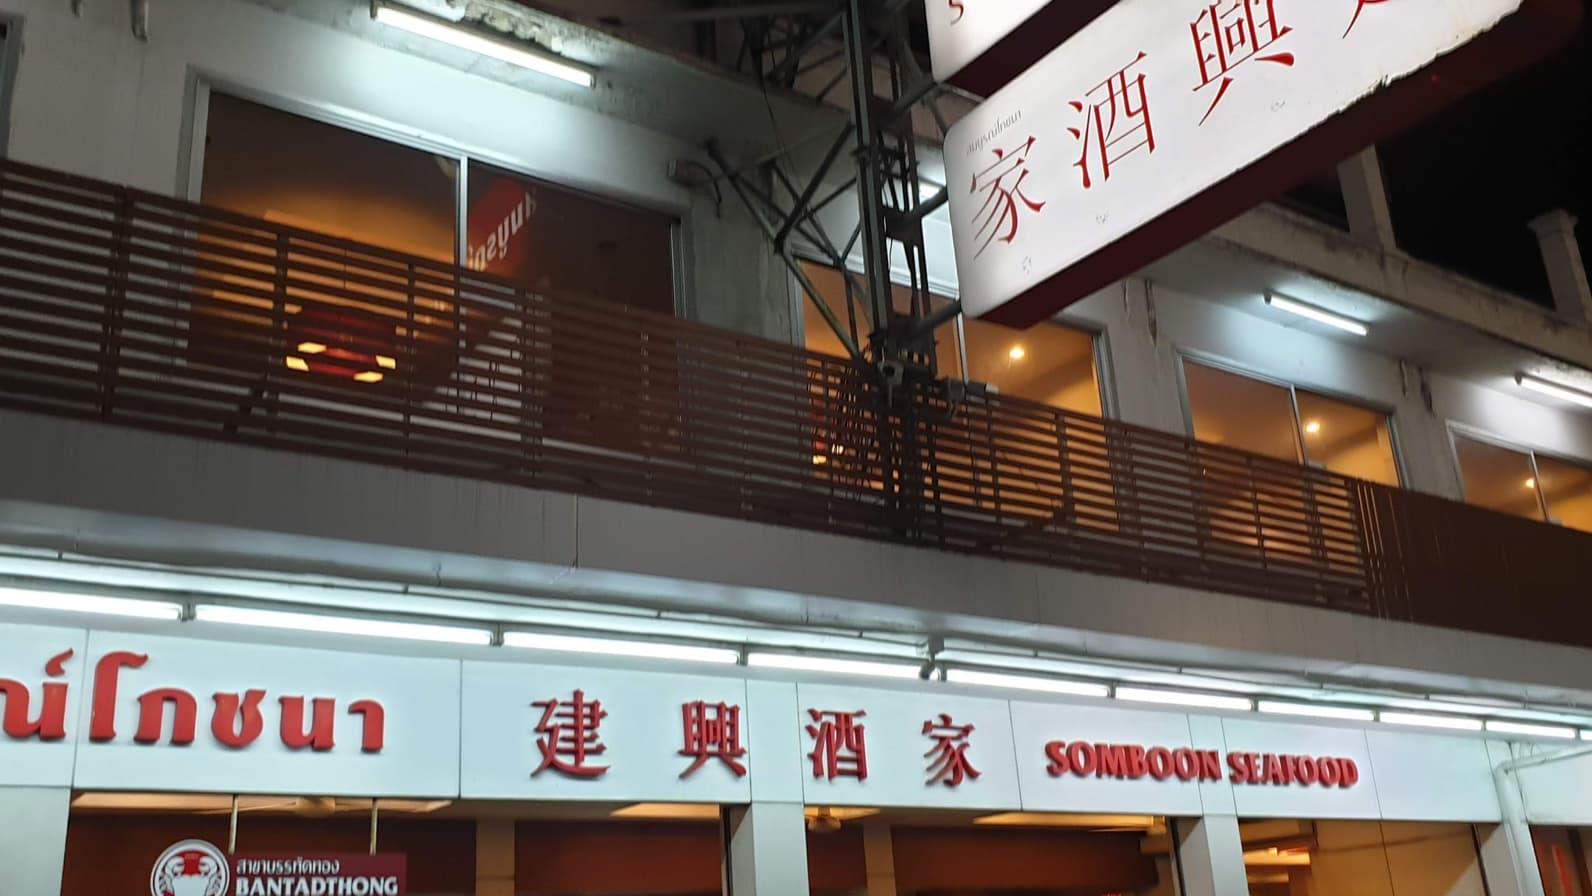 bangkok somboon バンコク ソンブーン 本店